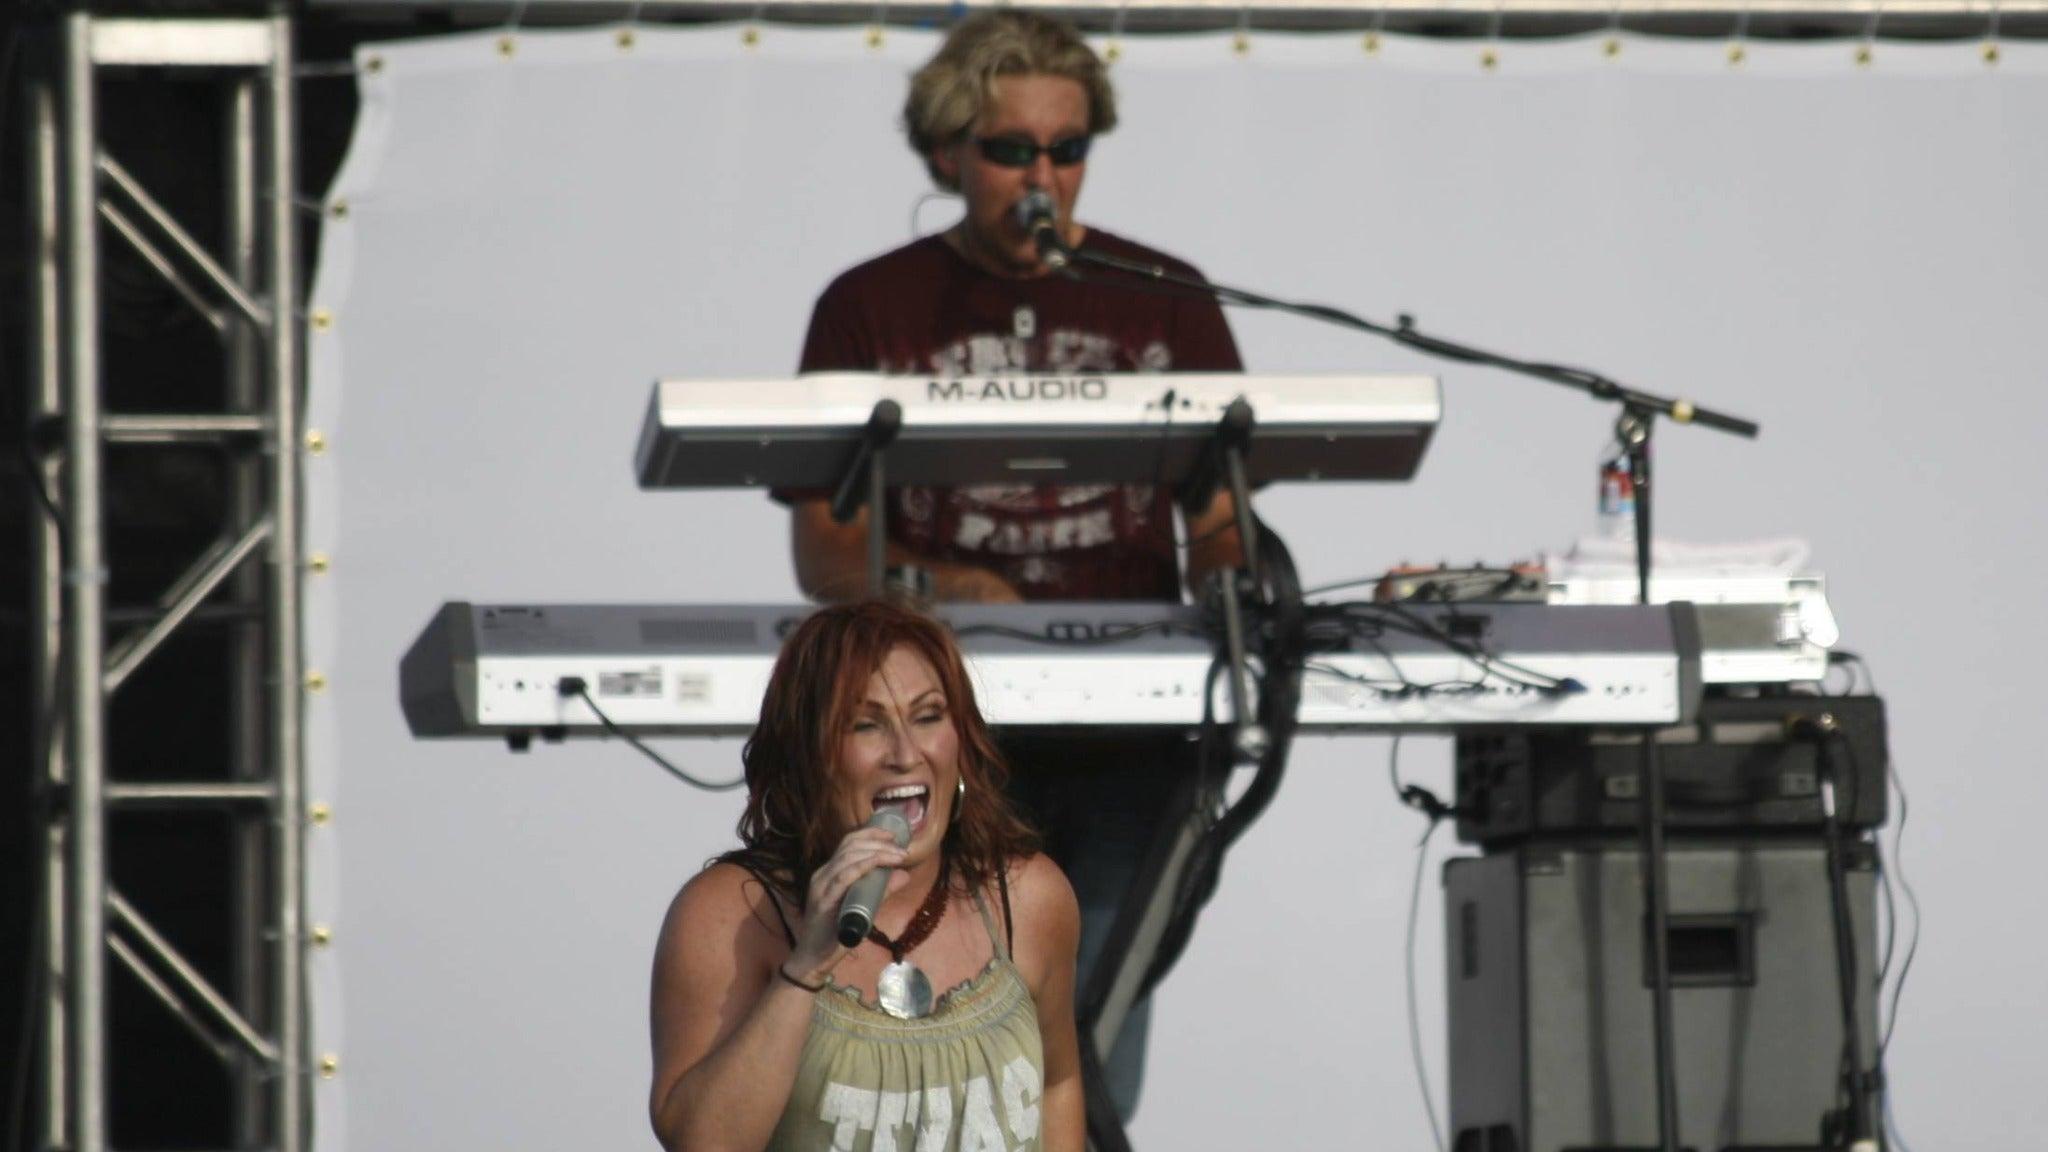 Jo Dee Messina at Golden Nugget-NV - Las Vegas, NV 89101